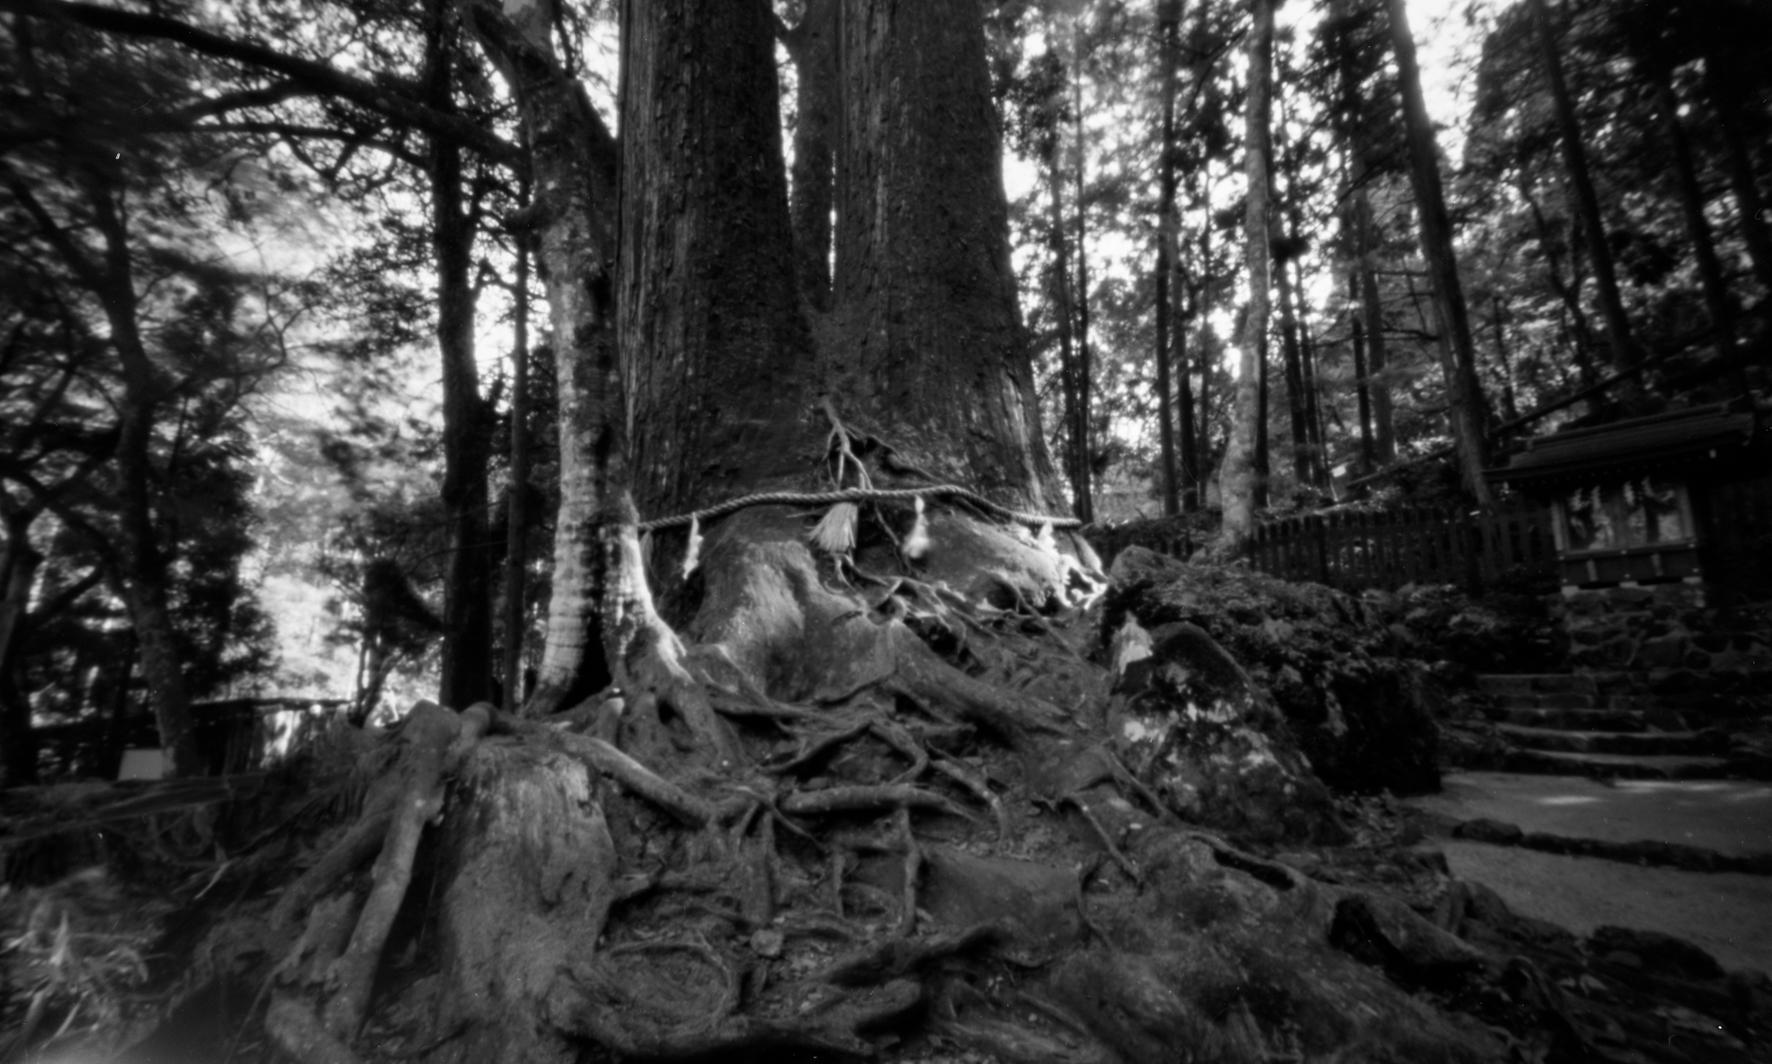 貴船神社 奥宮 相生の大杉。